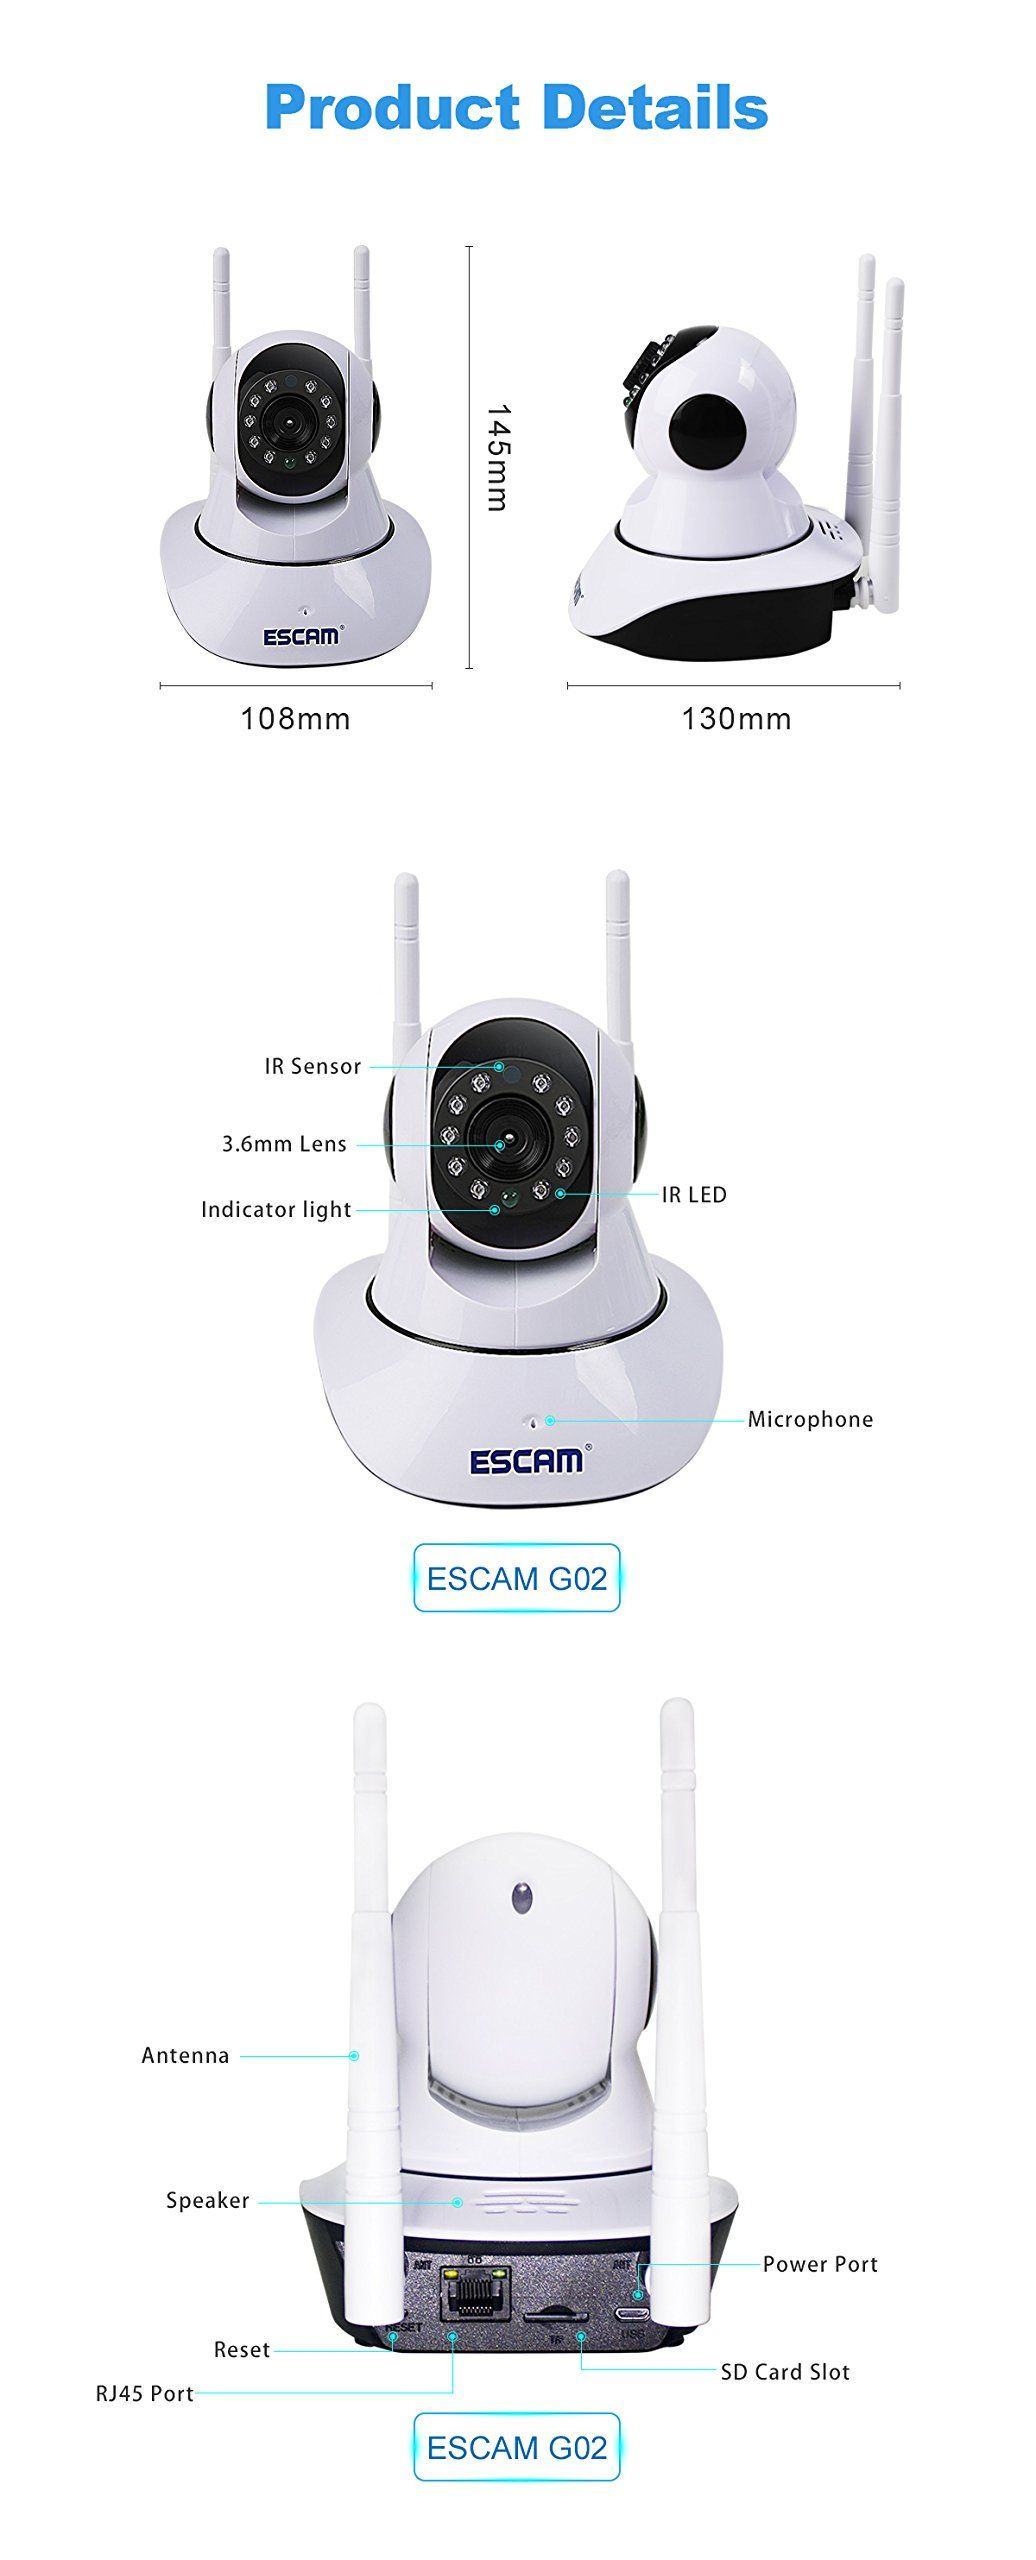 Escam Ip Camera Wireless Security Camera Surveillance System Hd 720p With Night Vision In 2020 Camera Surveillance System Wireless Security Cameras Surveillance Camera